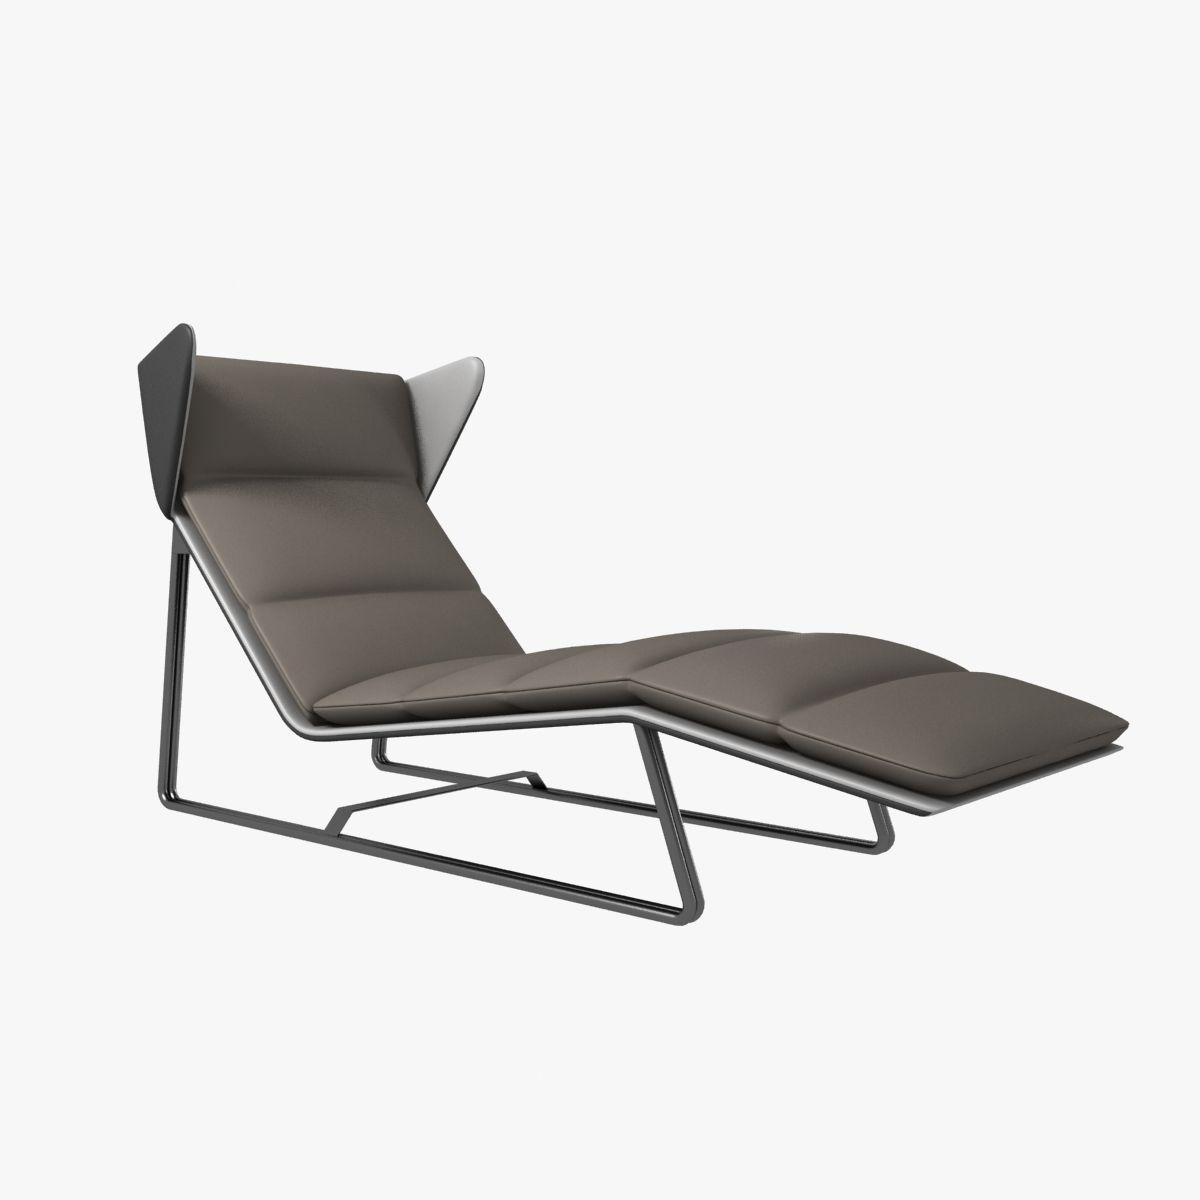 Modern chaise outdoor - Esedra Romea Modern Chaise Lounge 3d Model